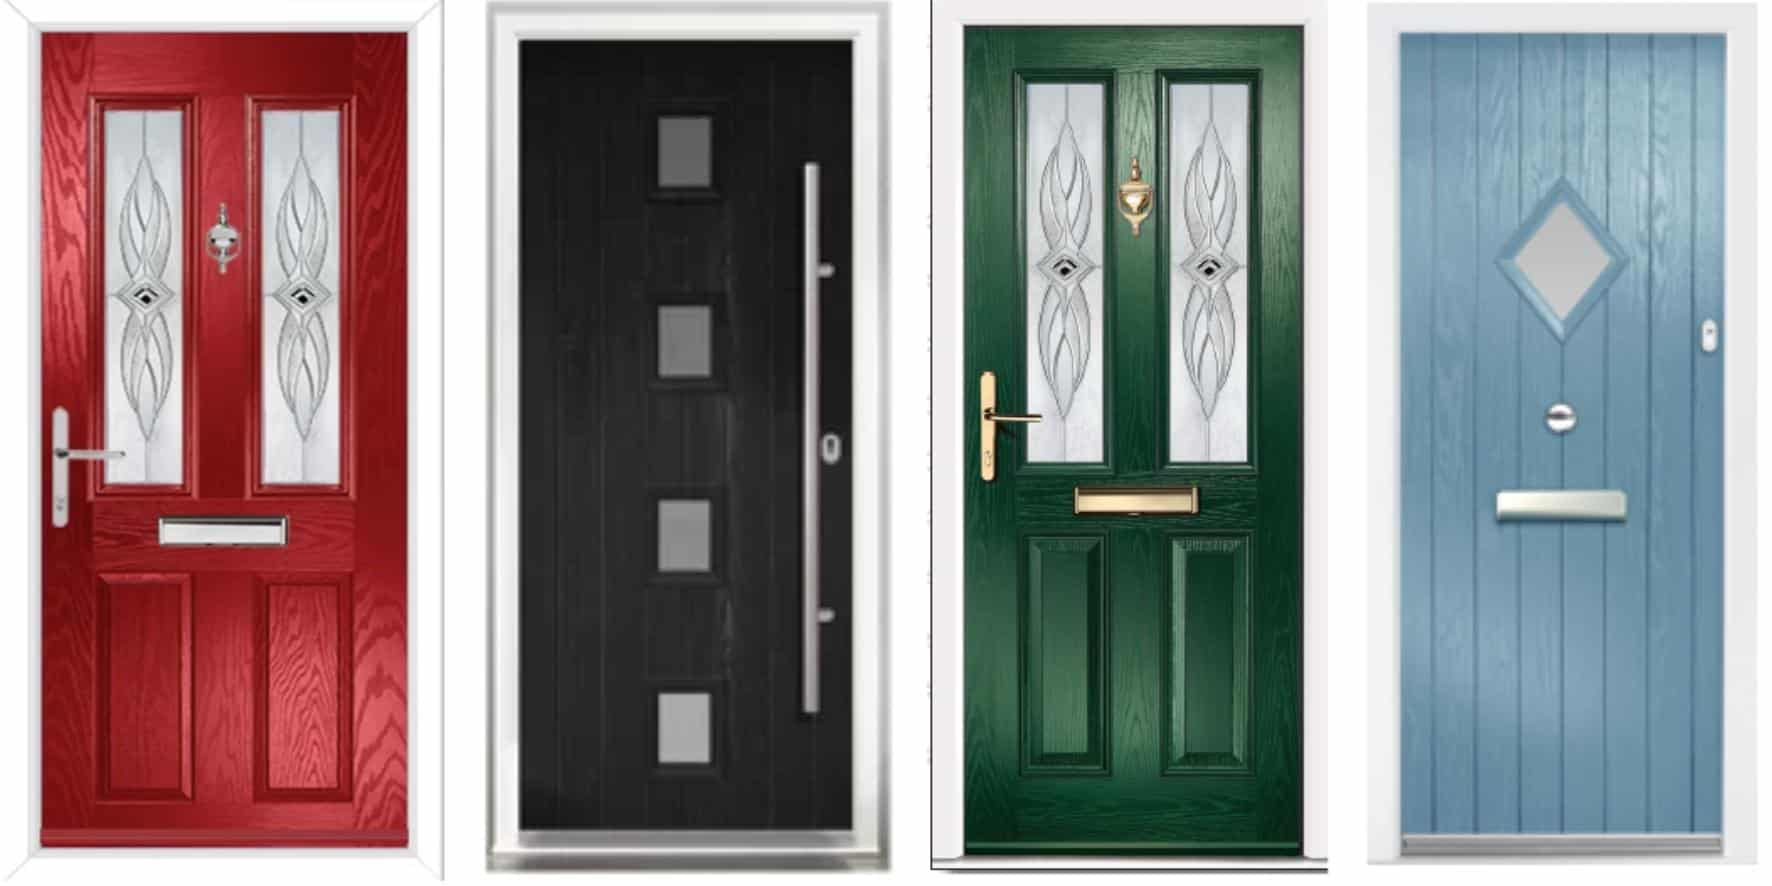 Dropped Composite Door Realignment, multi point lock repair and replacement door handles